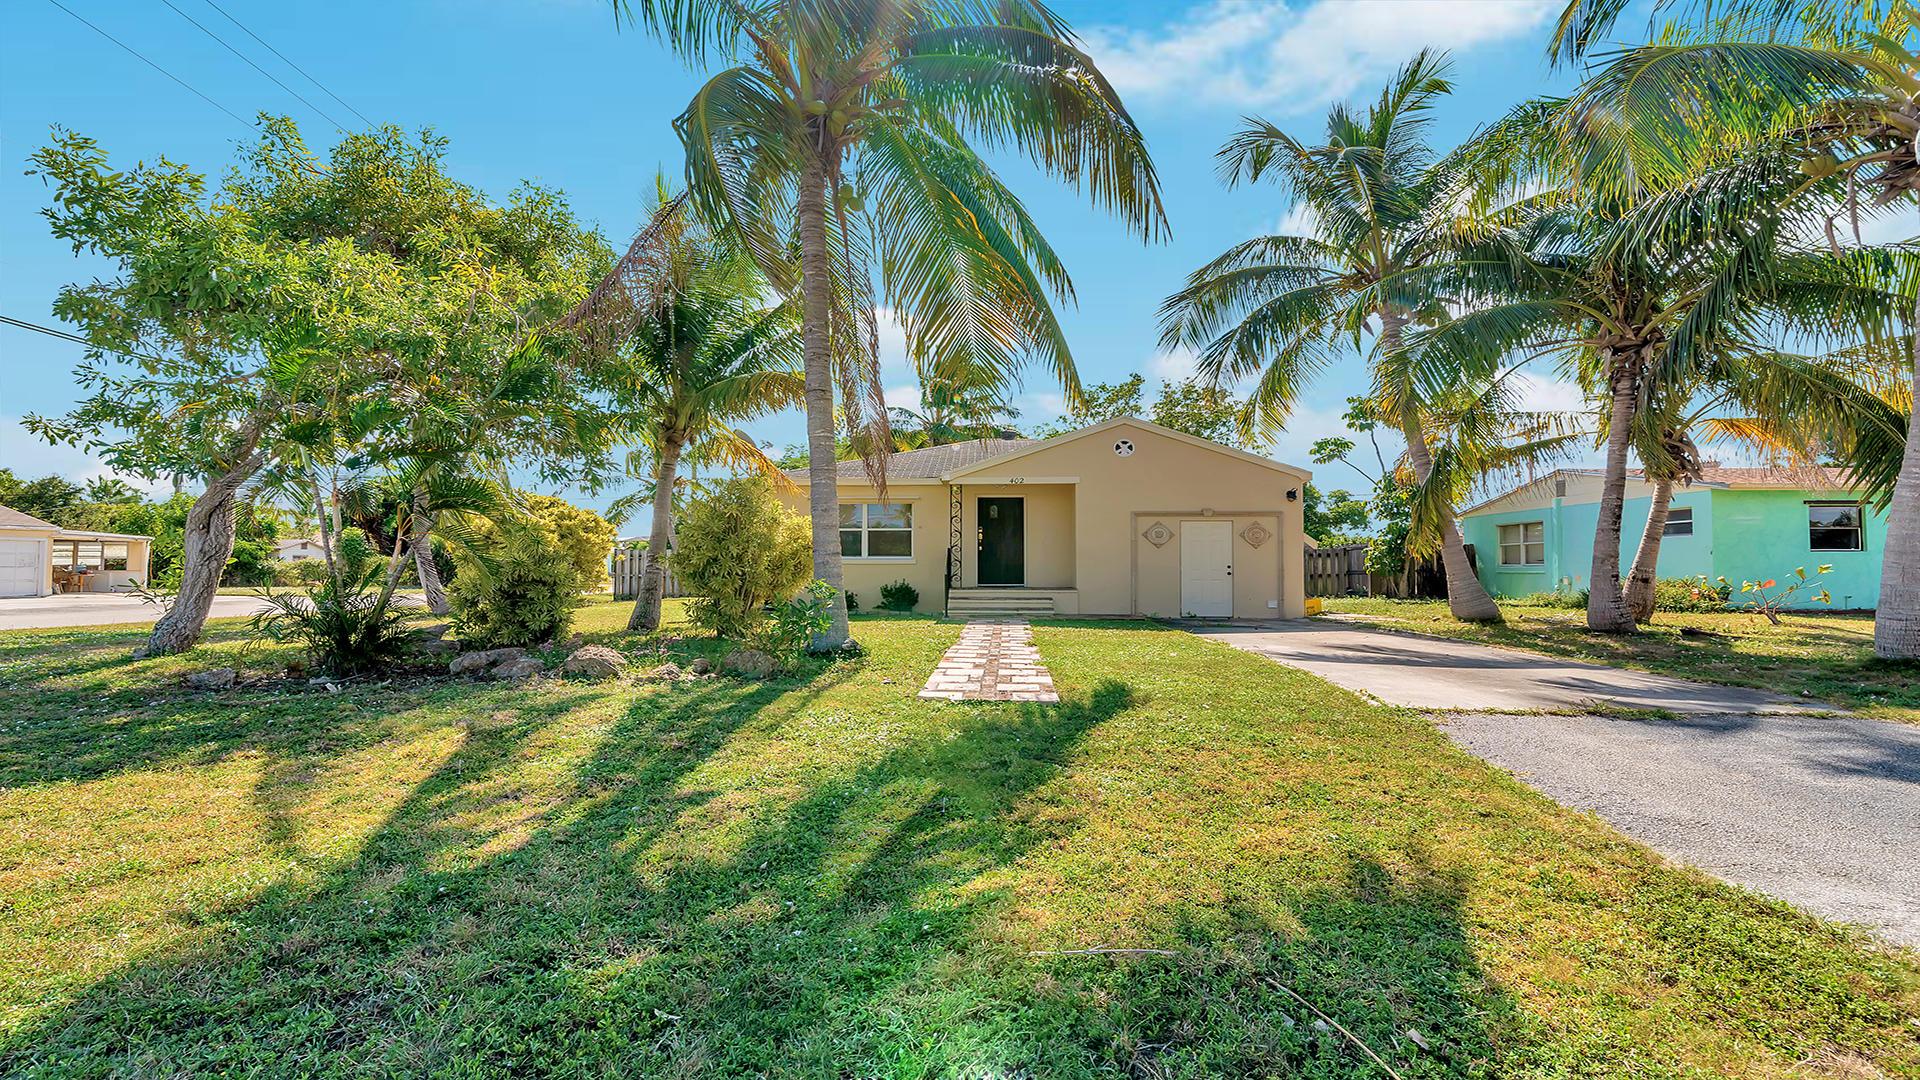 402 W Mango, Lantana, Florida 33462